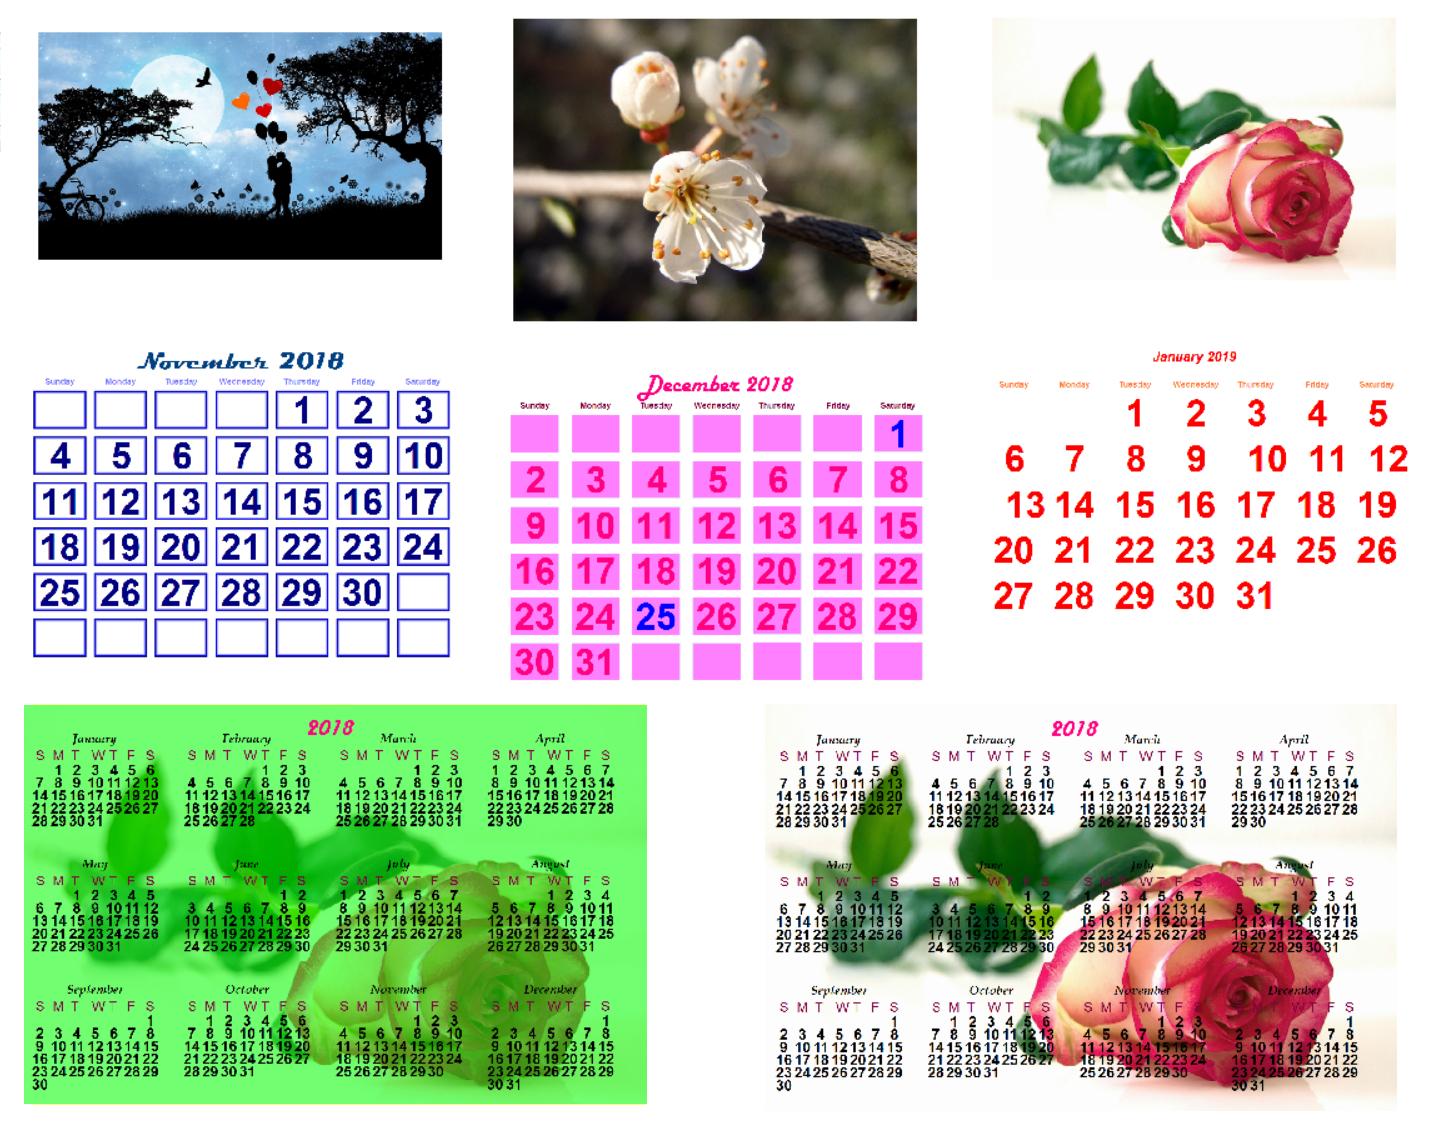 I Will Send You A Copy Of My Calendar Maker Windows throughout Win Calendar Creator